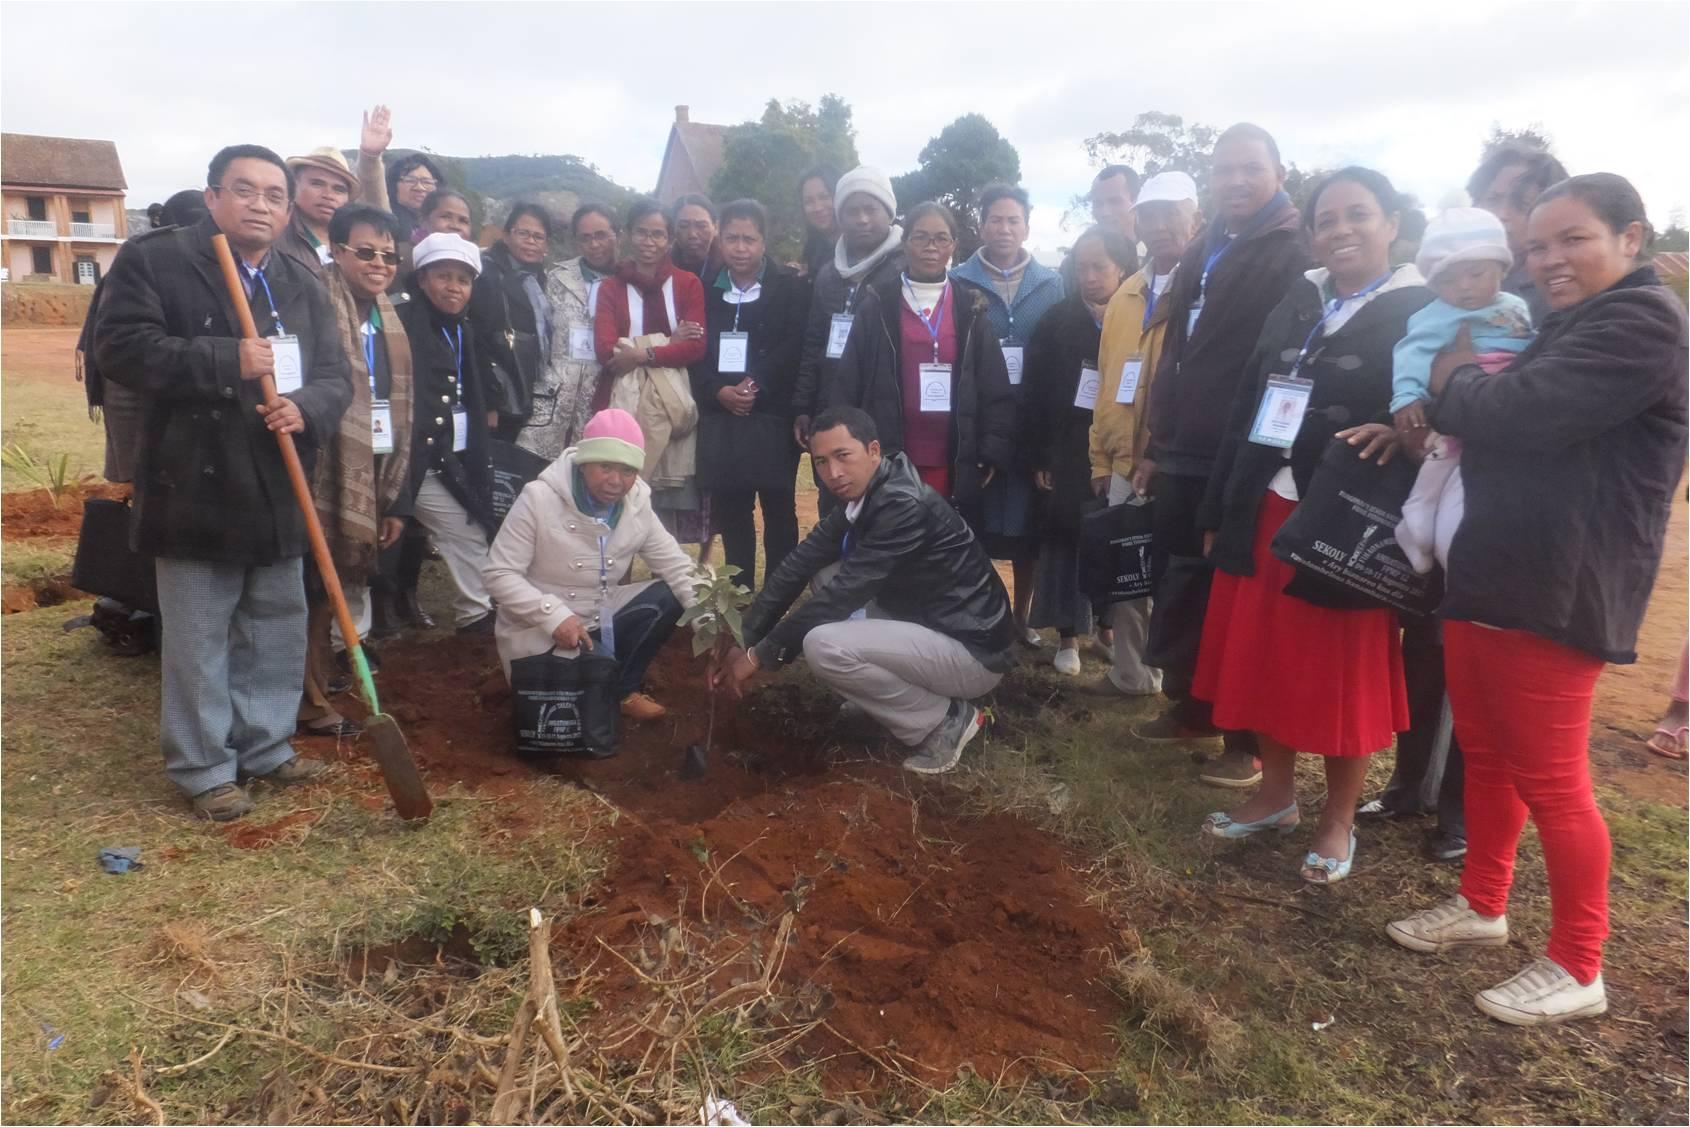 FJKM School Principals planting an Andringitra leucomacrantha at Ambatomanga High School